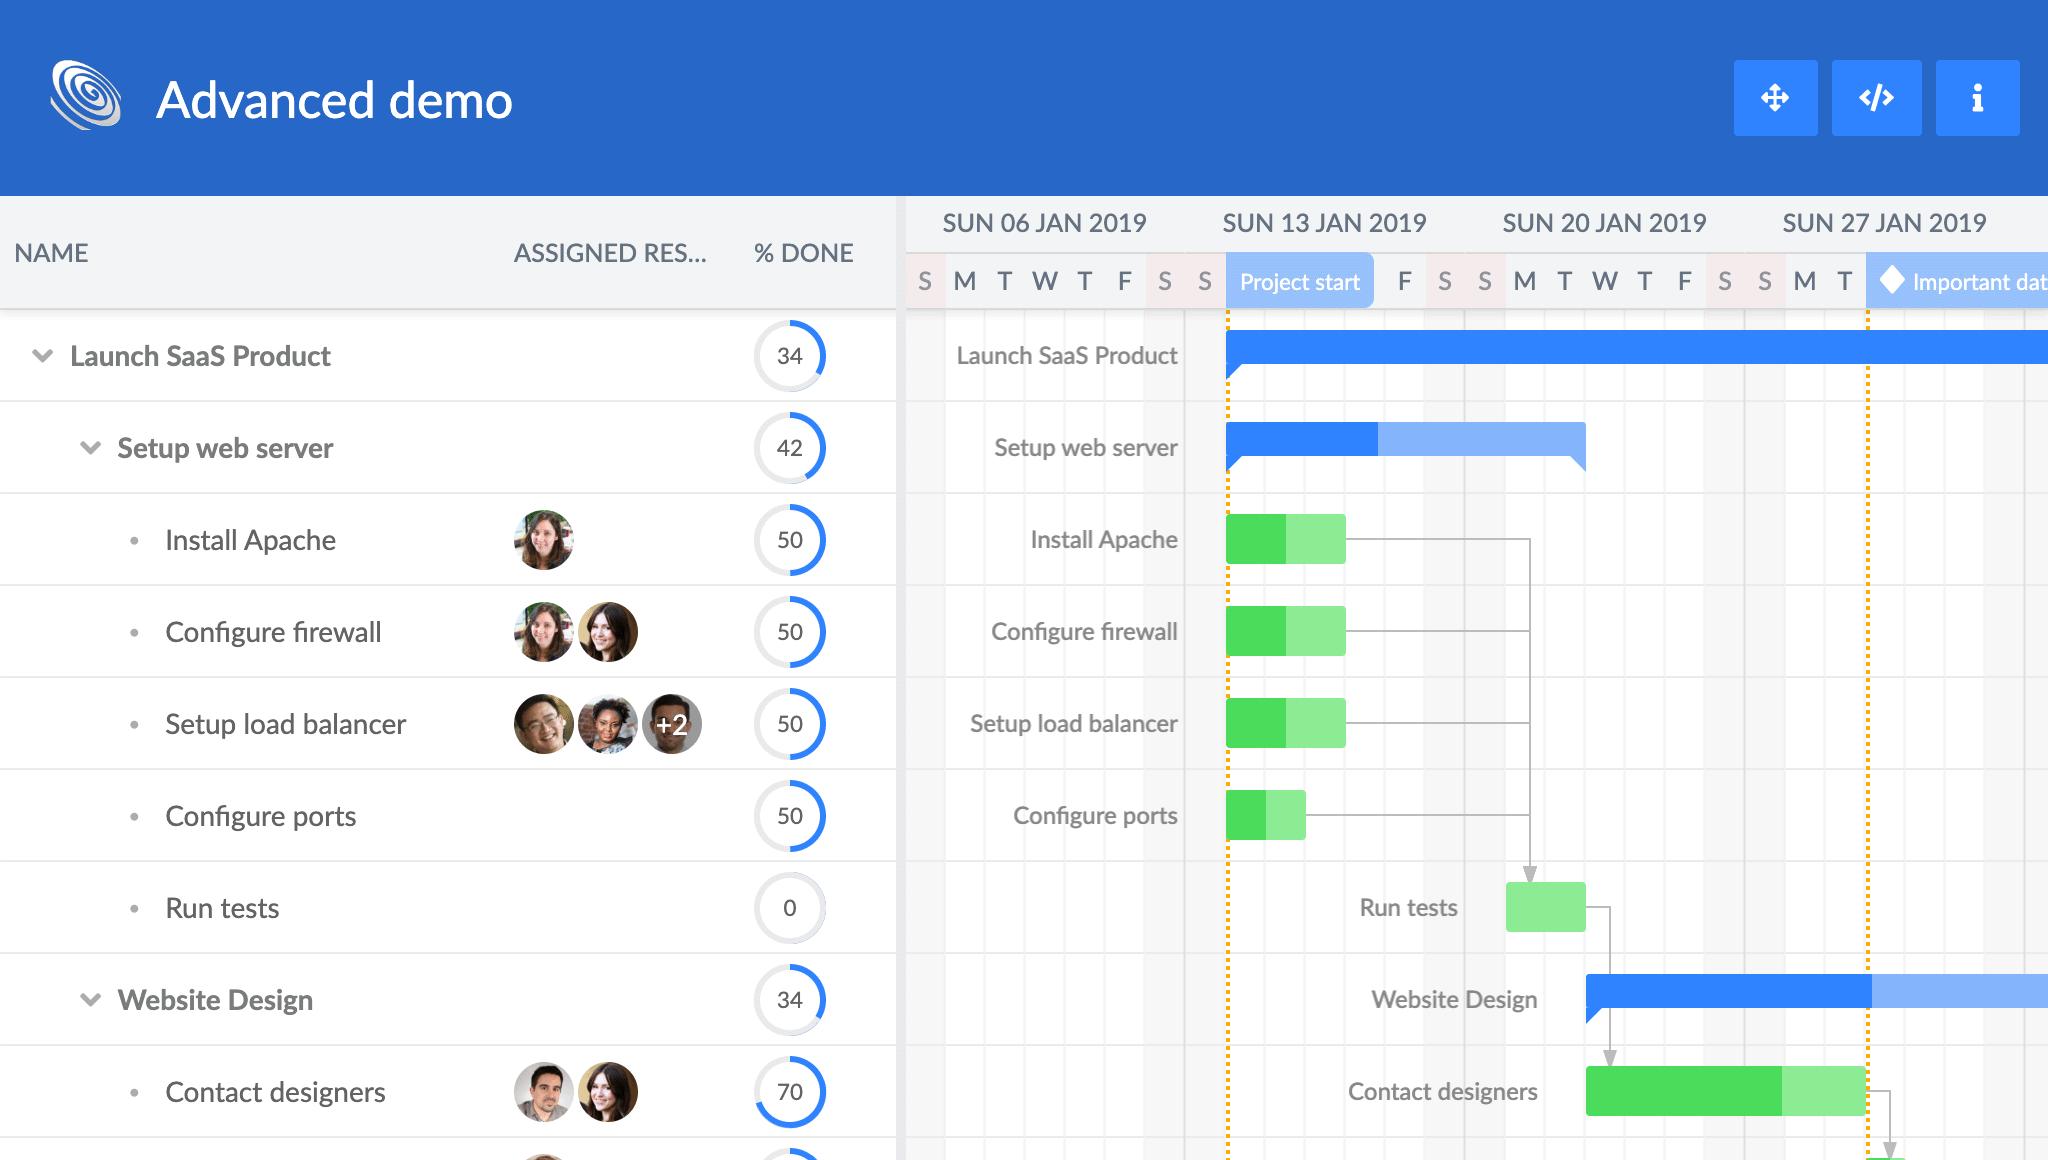 Advanced demo using percentdone column with circular display